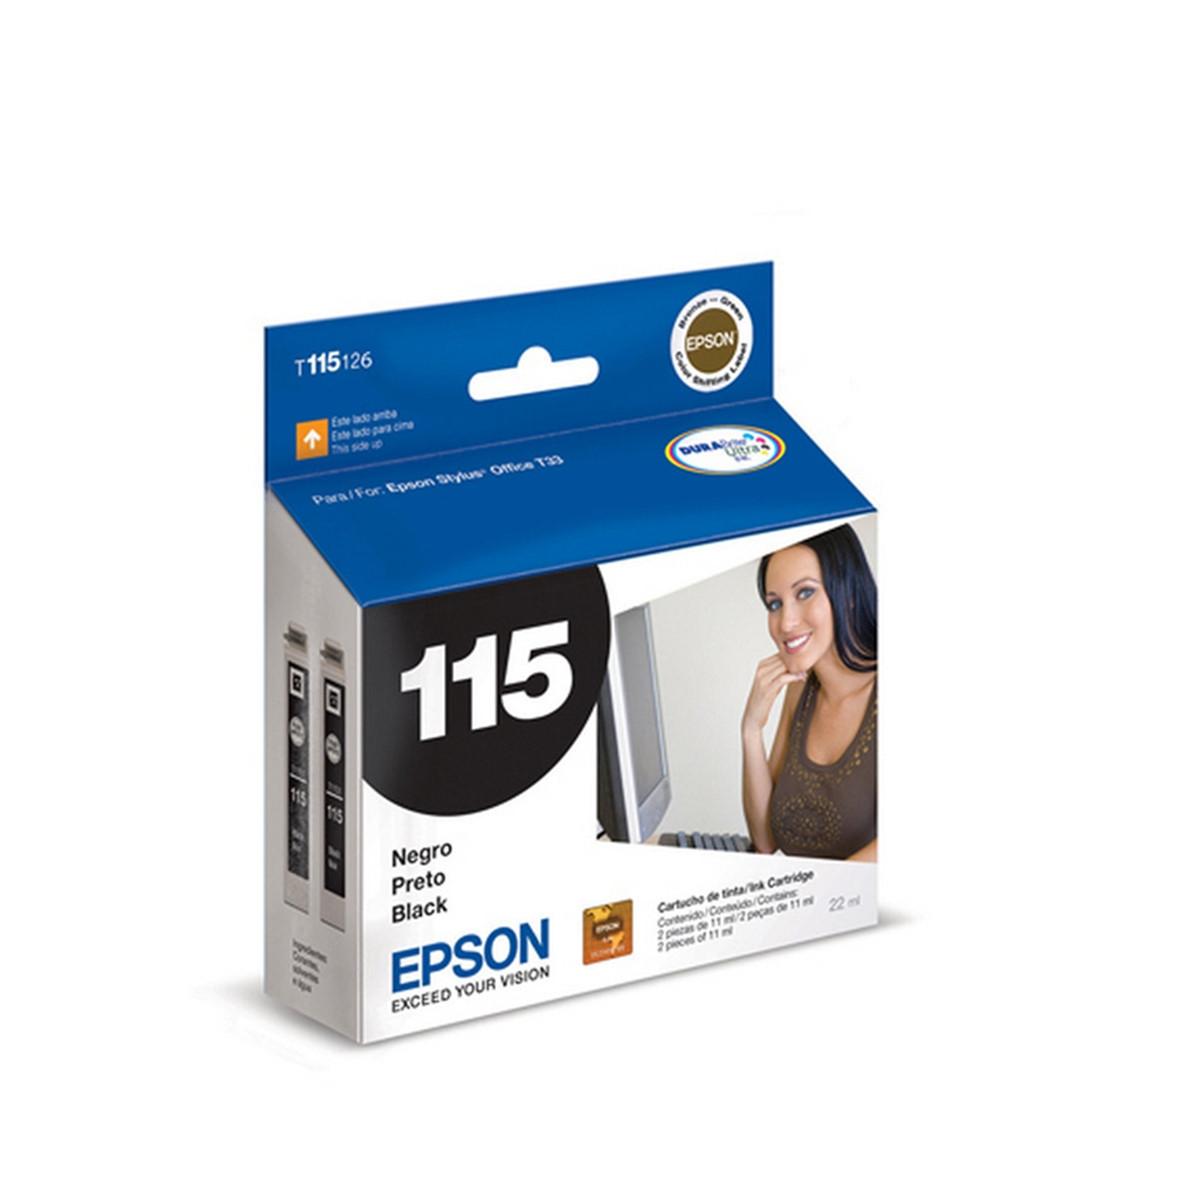 Cartucho de Tinta Epson 115, T115126 | Preto para T33 TX515FN T1110 | Original 22ml